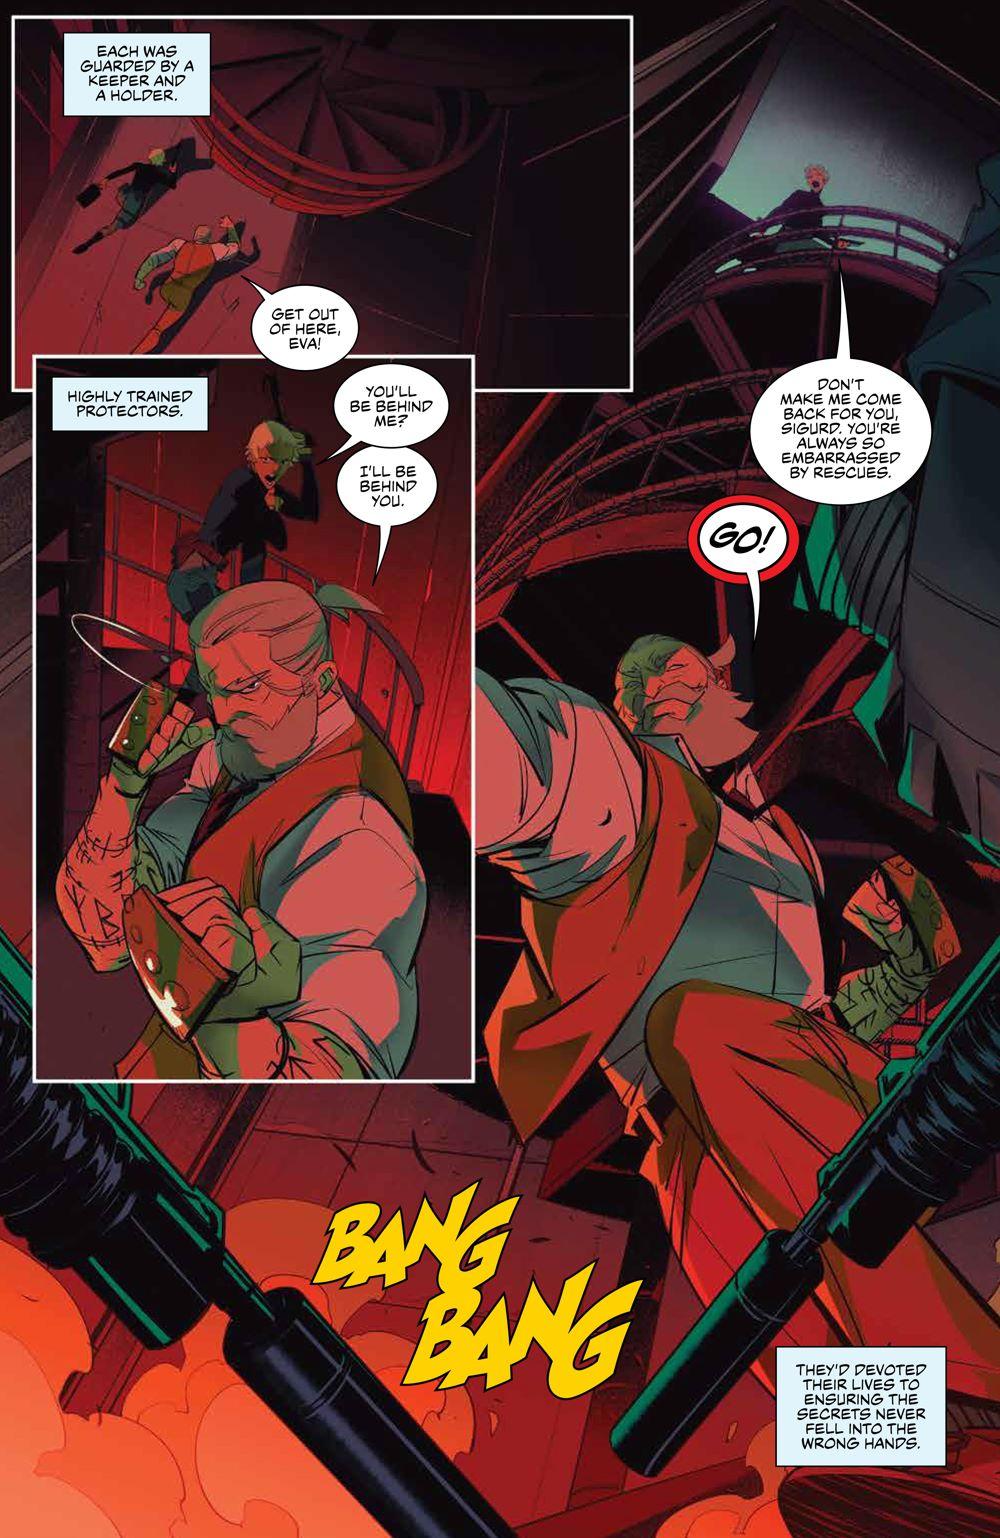 SevenSecrets_v1_SC_PRESS_12 ComicList Previews: SEVEN SECRETS VOLUME 1 TP